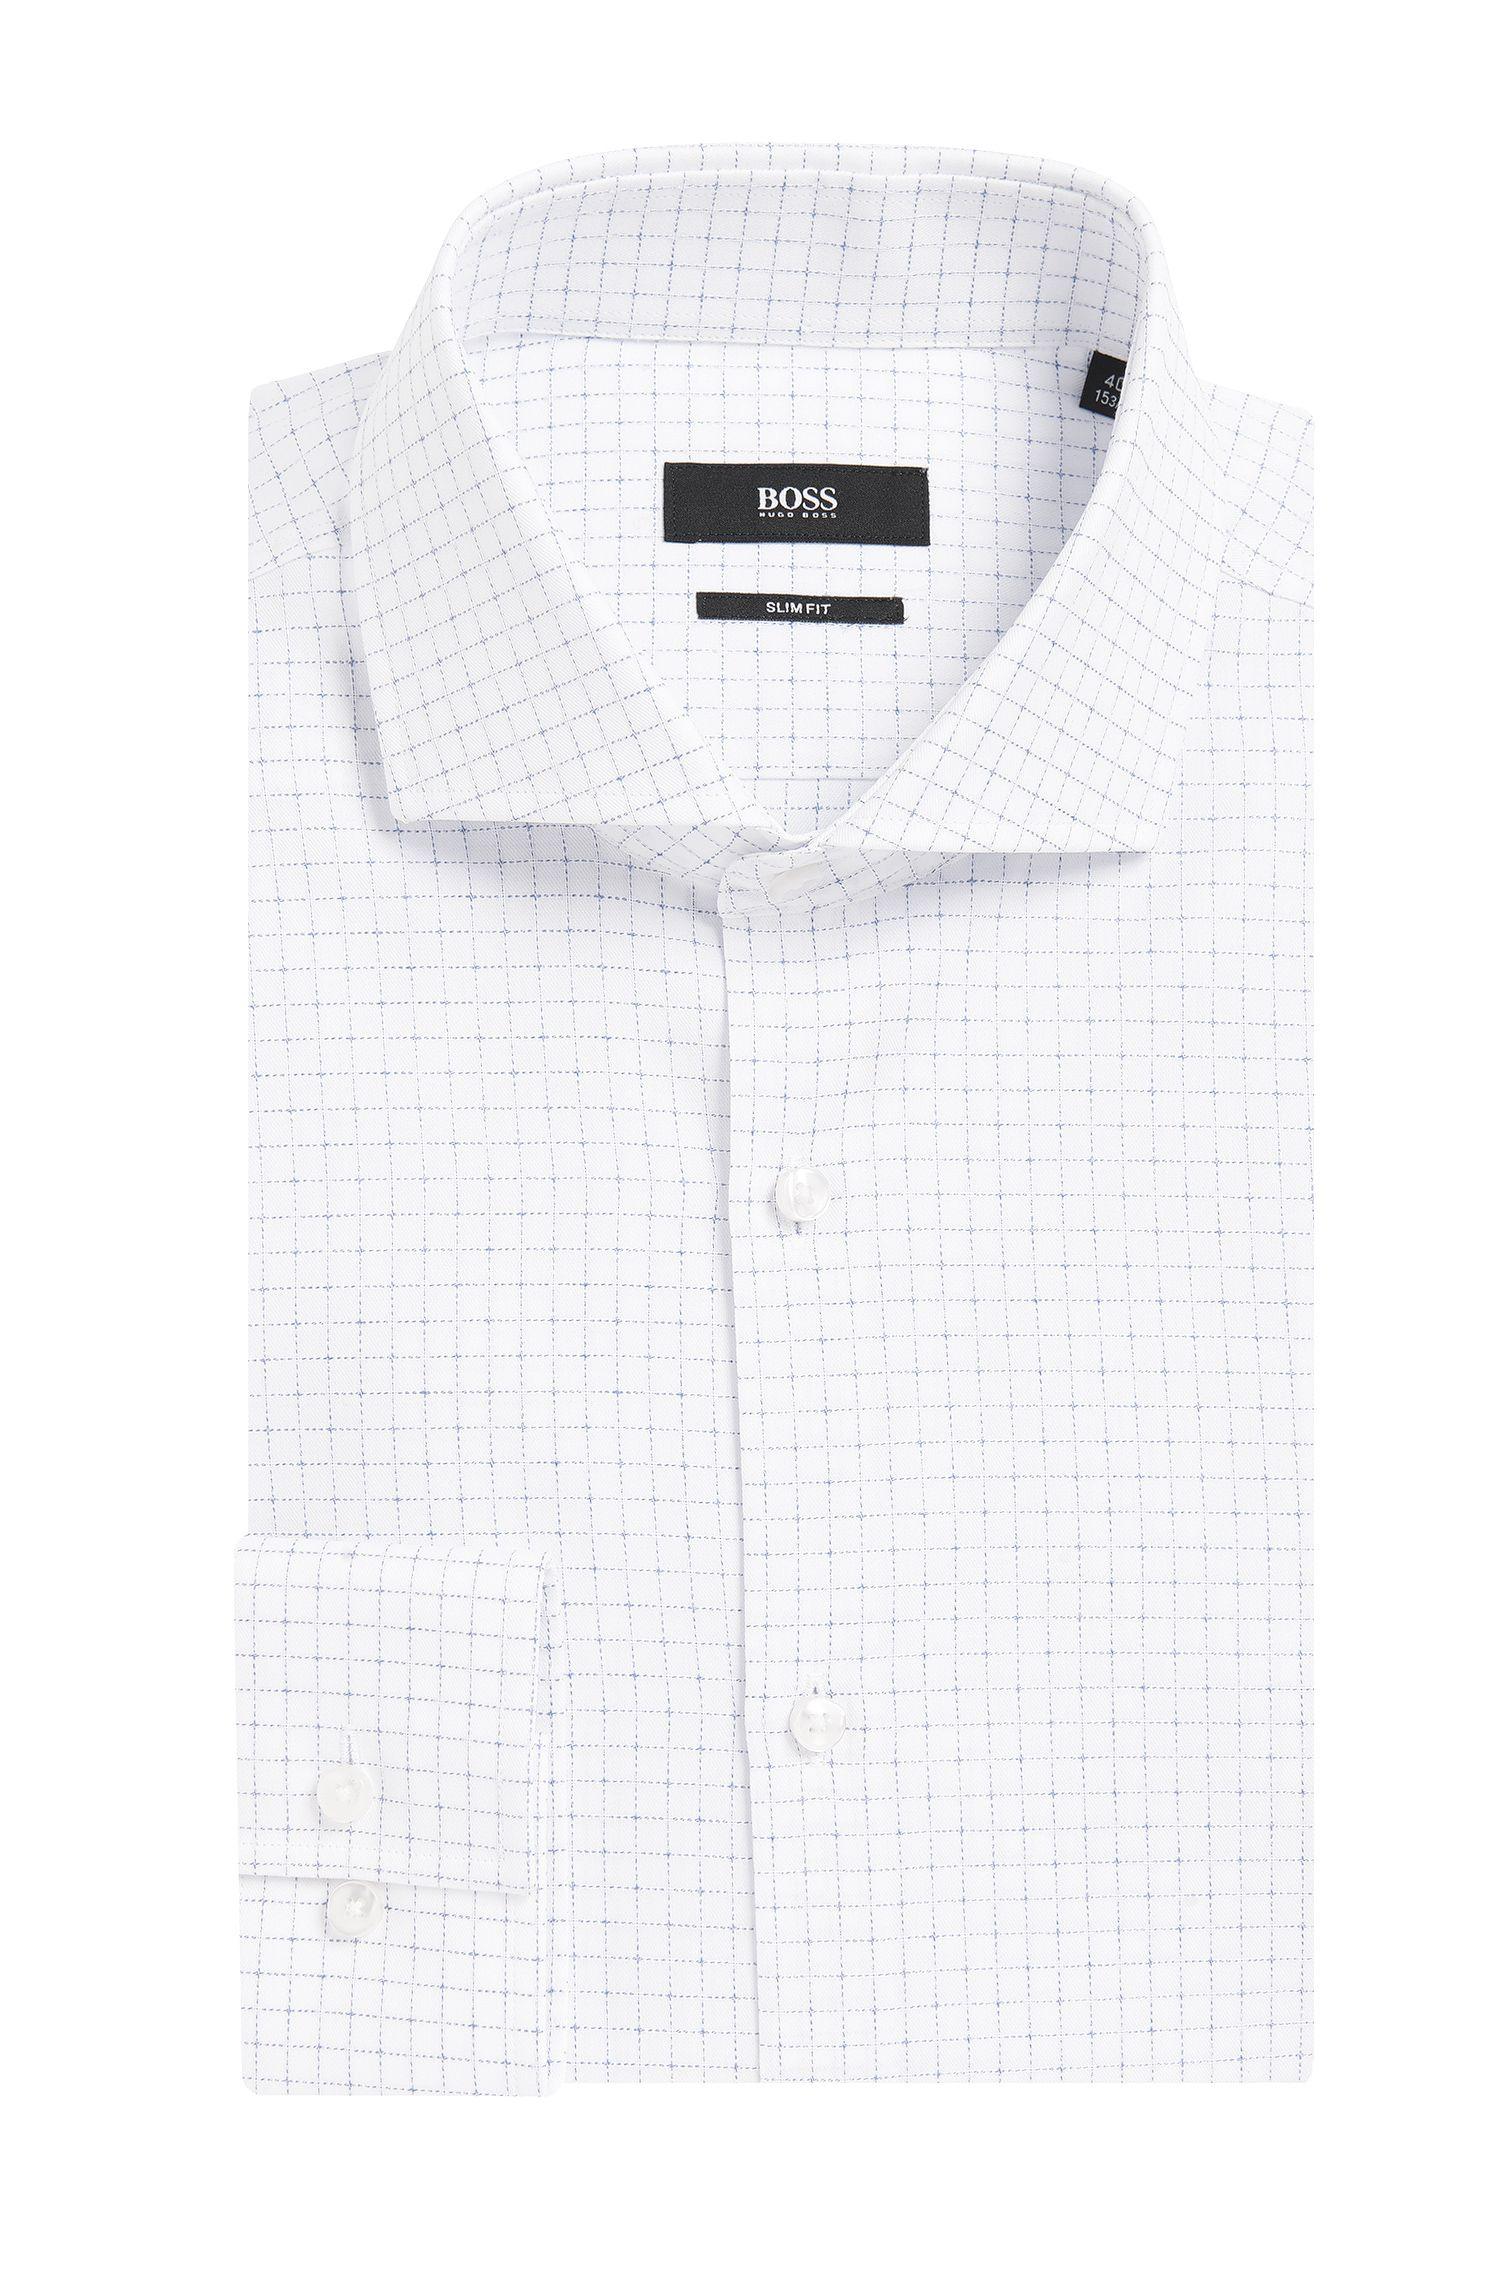 'Jason' | Slim Fit, Italian Cotton Window Pane Dress Shirt